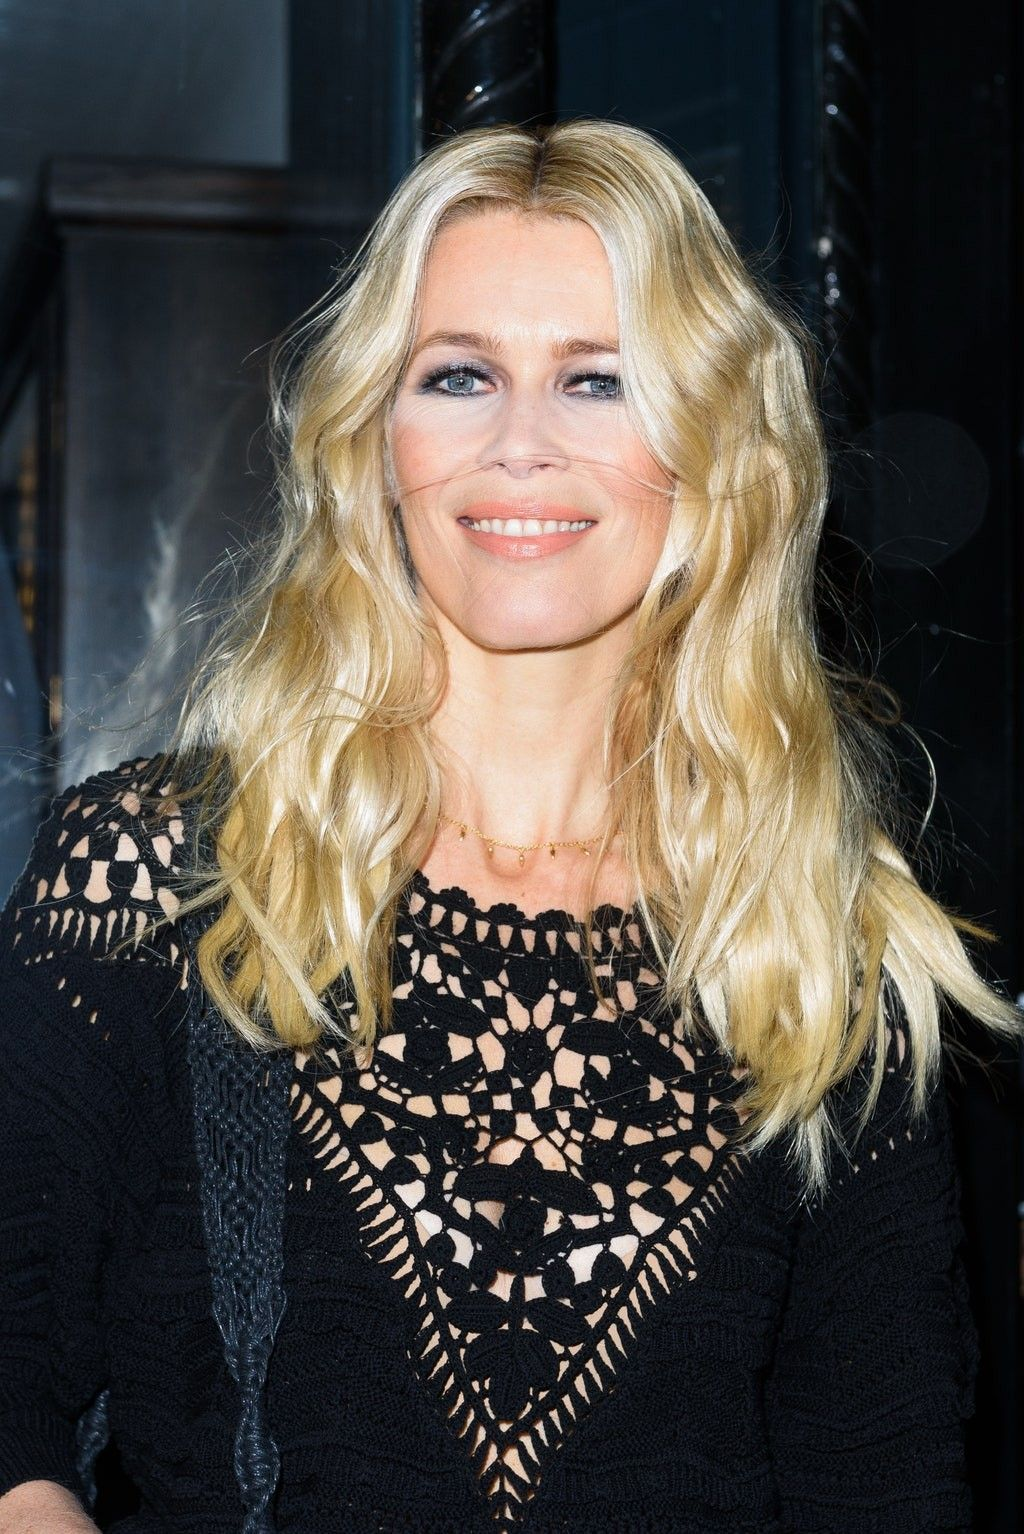 Claudia Schiffer Beauty Routines Blonde Celebrities Claudia Schiffer